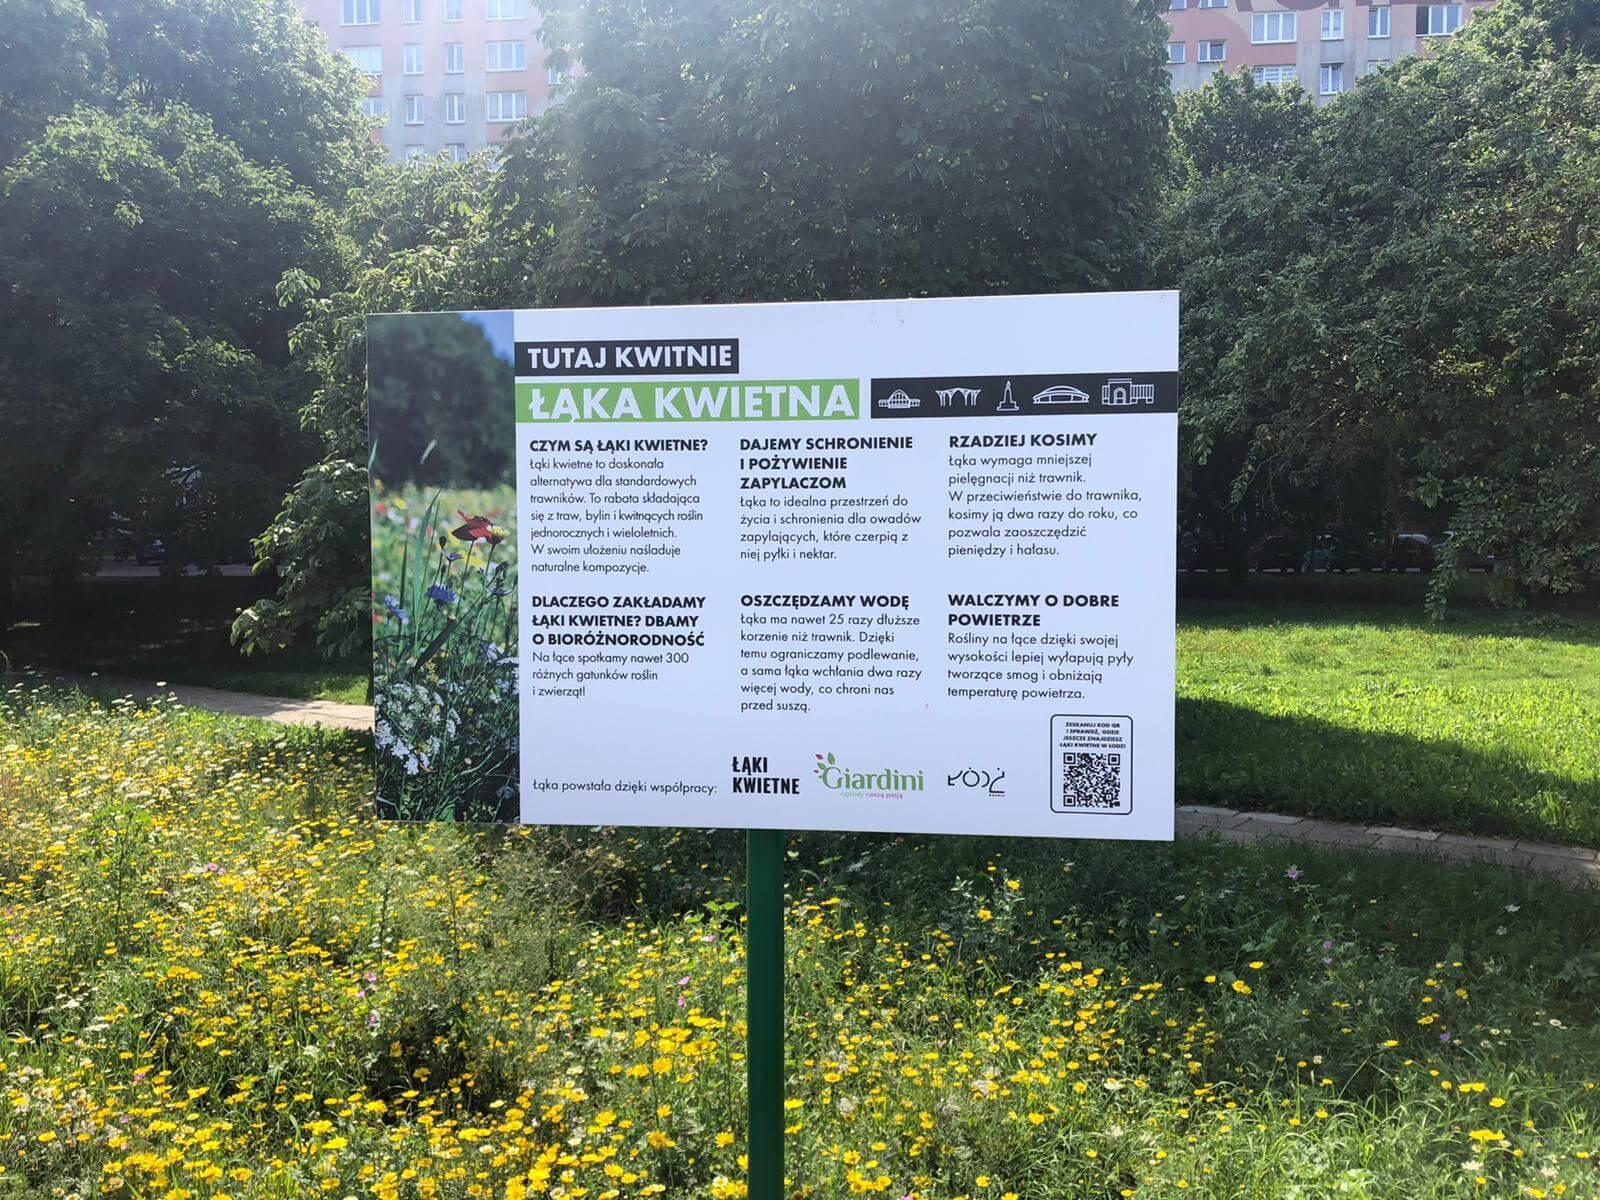 Łąka kwietna Łódź